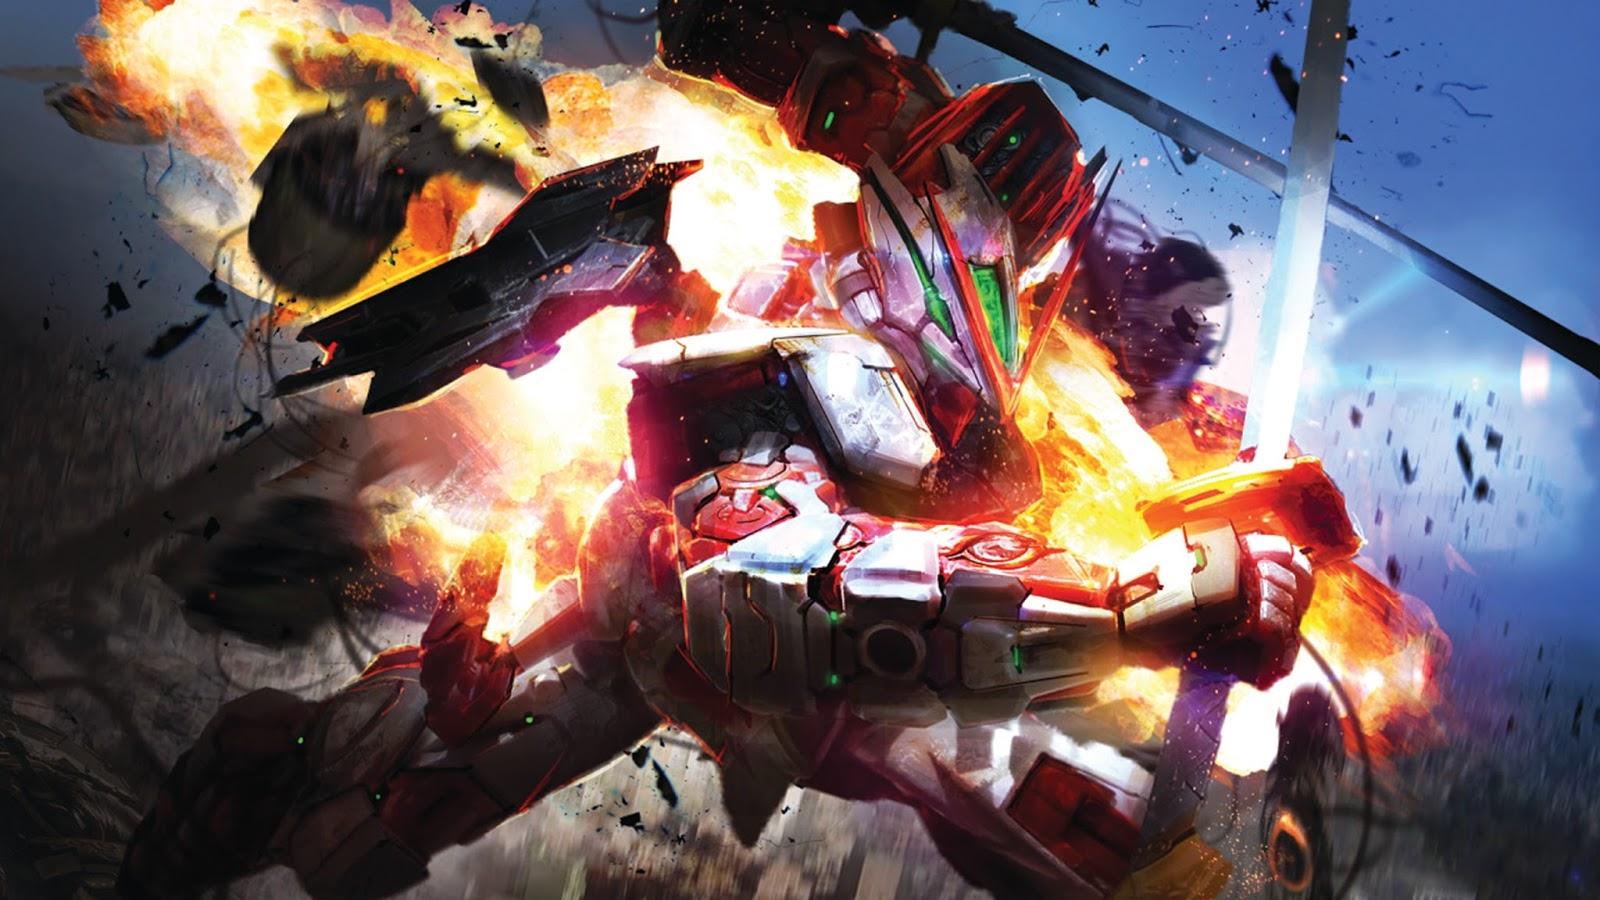 Gundam holique gundam hd wallpaper astray red frame - Gundam wallpaper hd ...